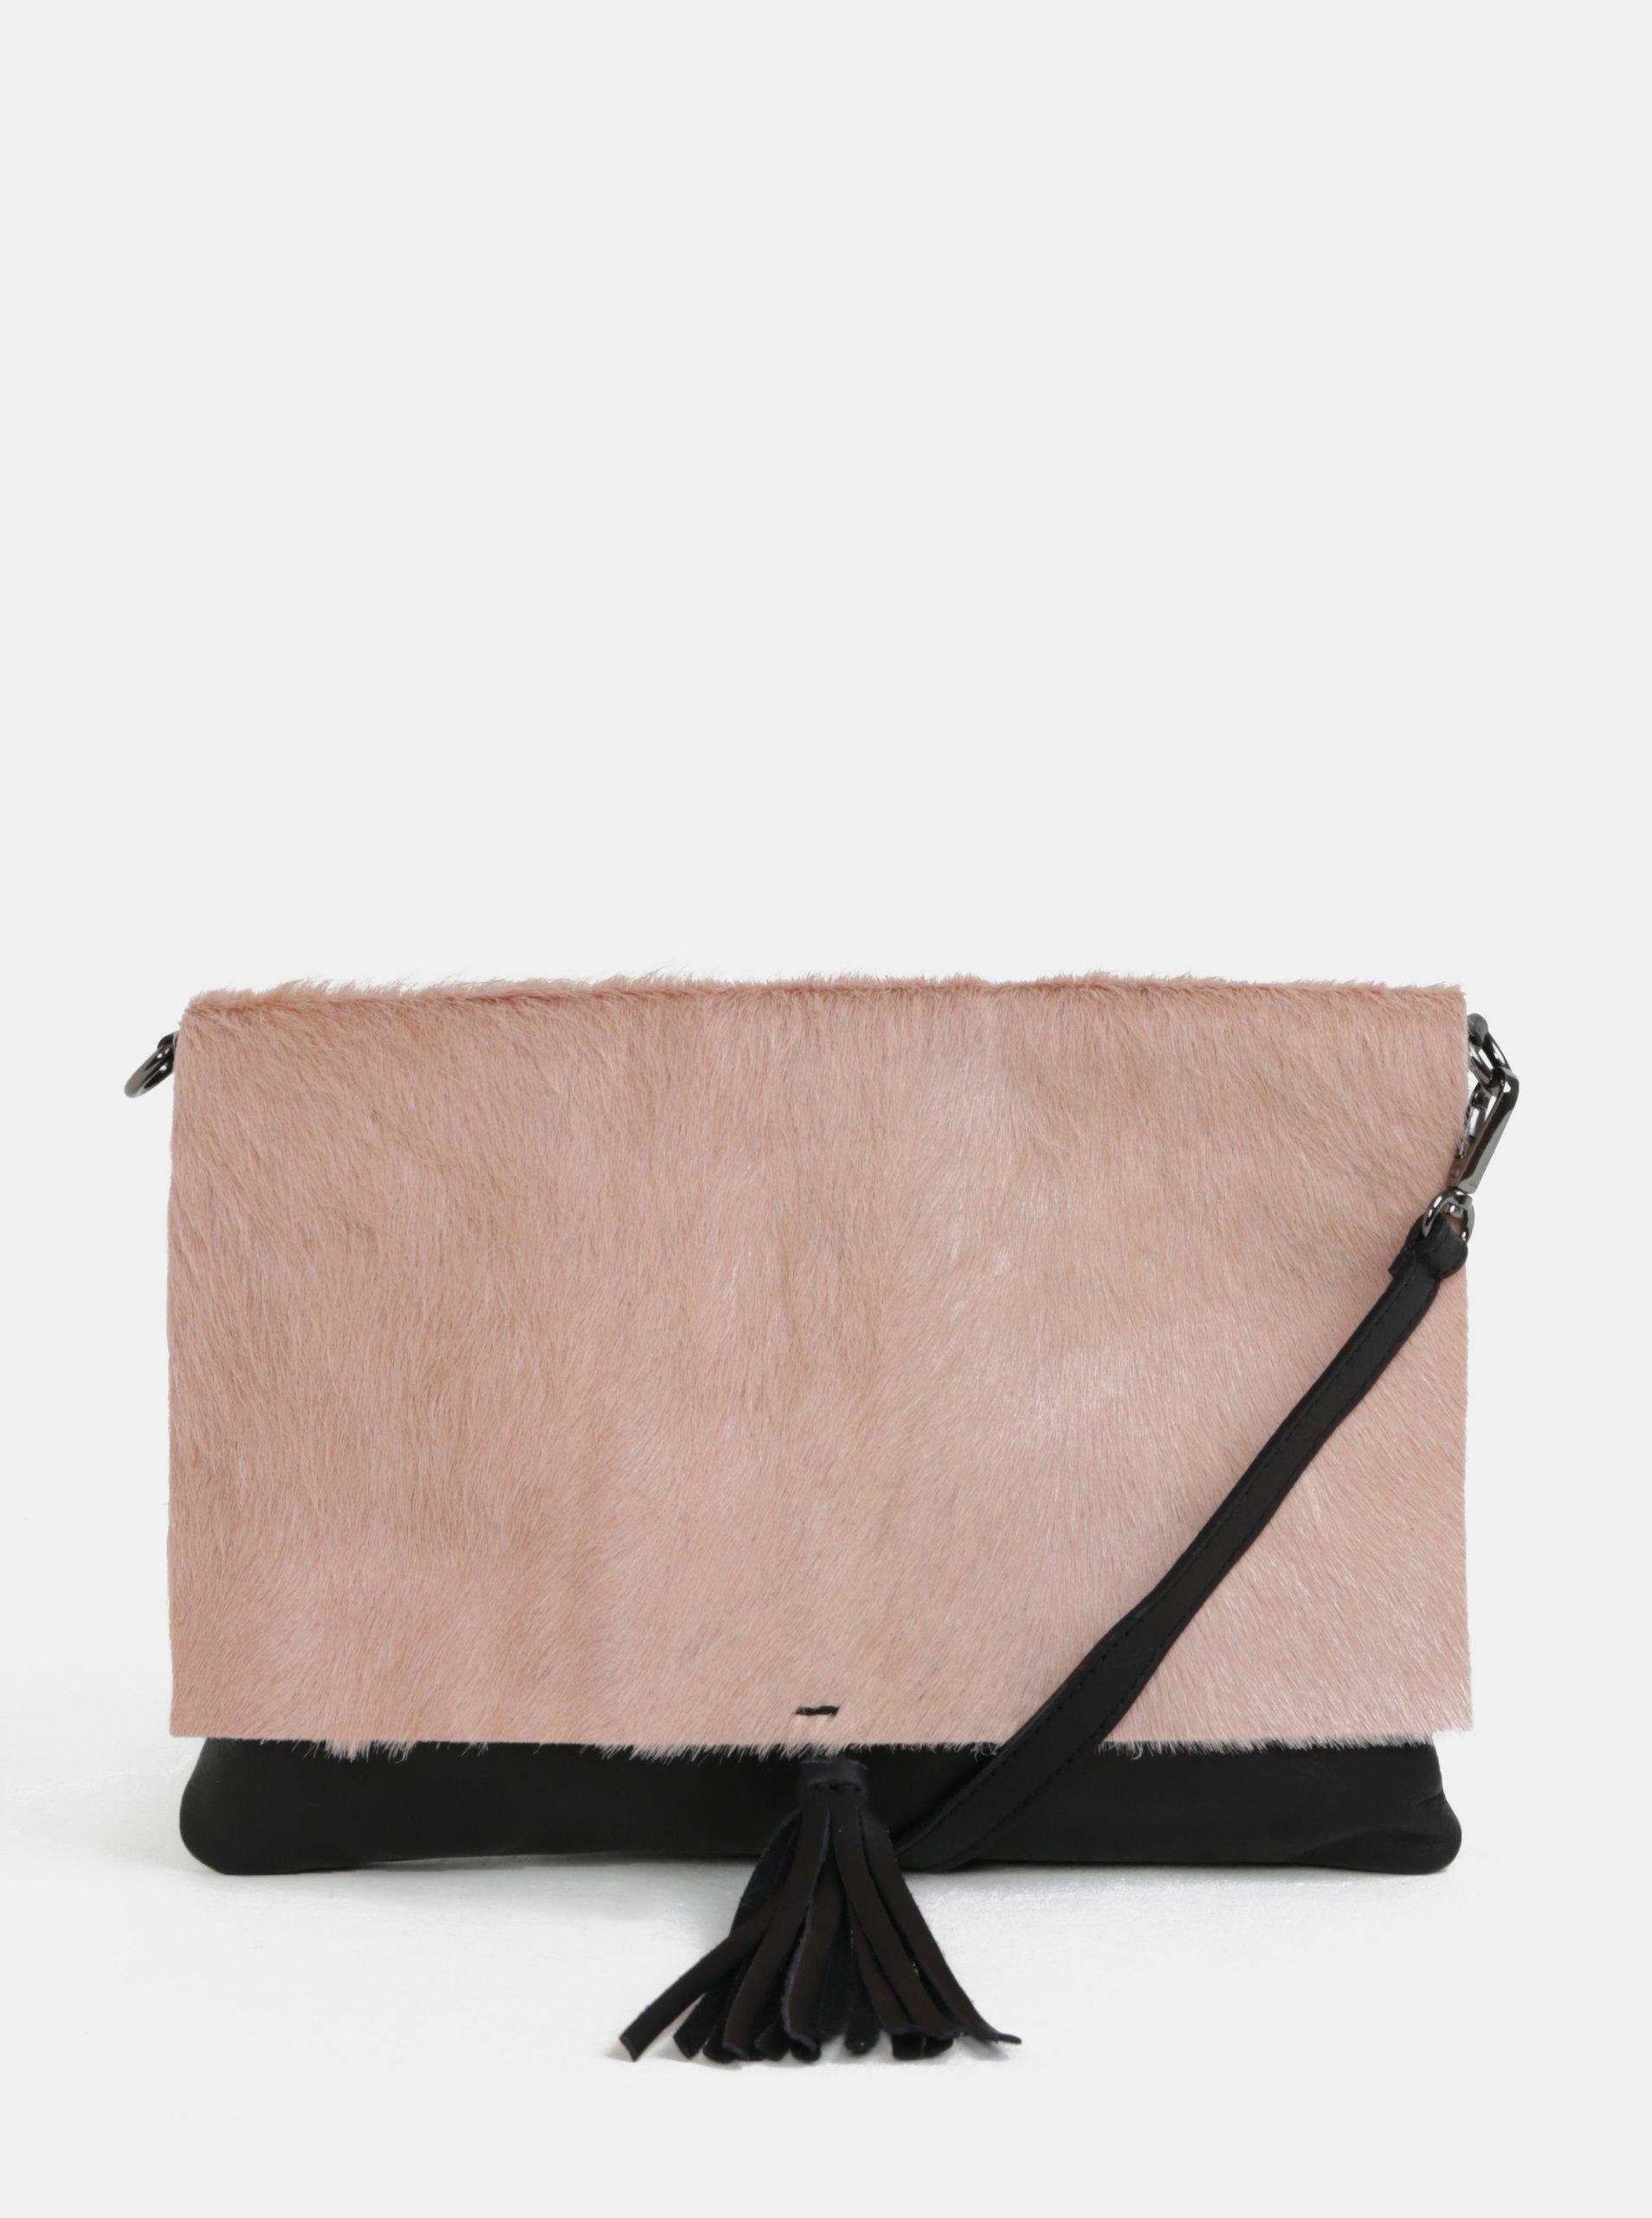 7afa6fd1fa Černo-růžová kožená crossbody kabelka s kožešinovou klopou ZOOT